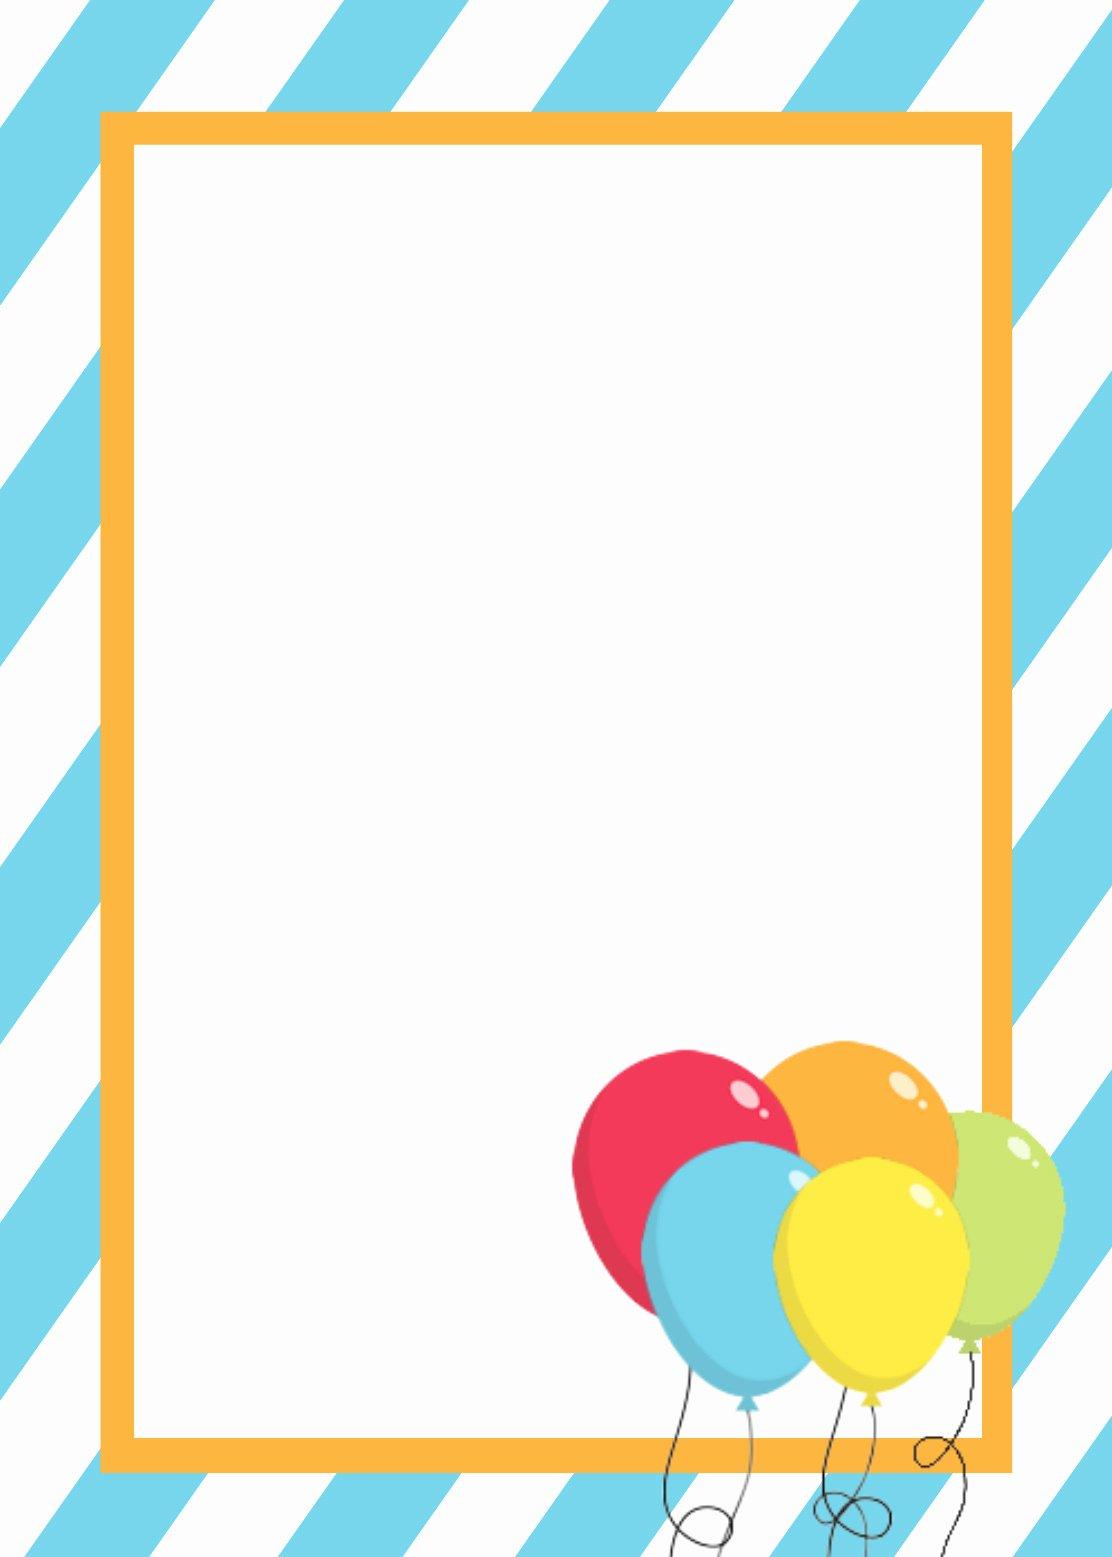 Free Printable Birthday Invitation Templates Best Of Free Printable Birthday Invitation Templates